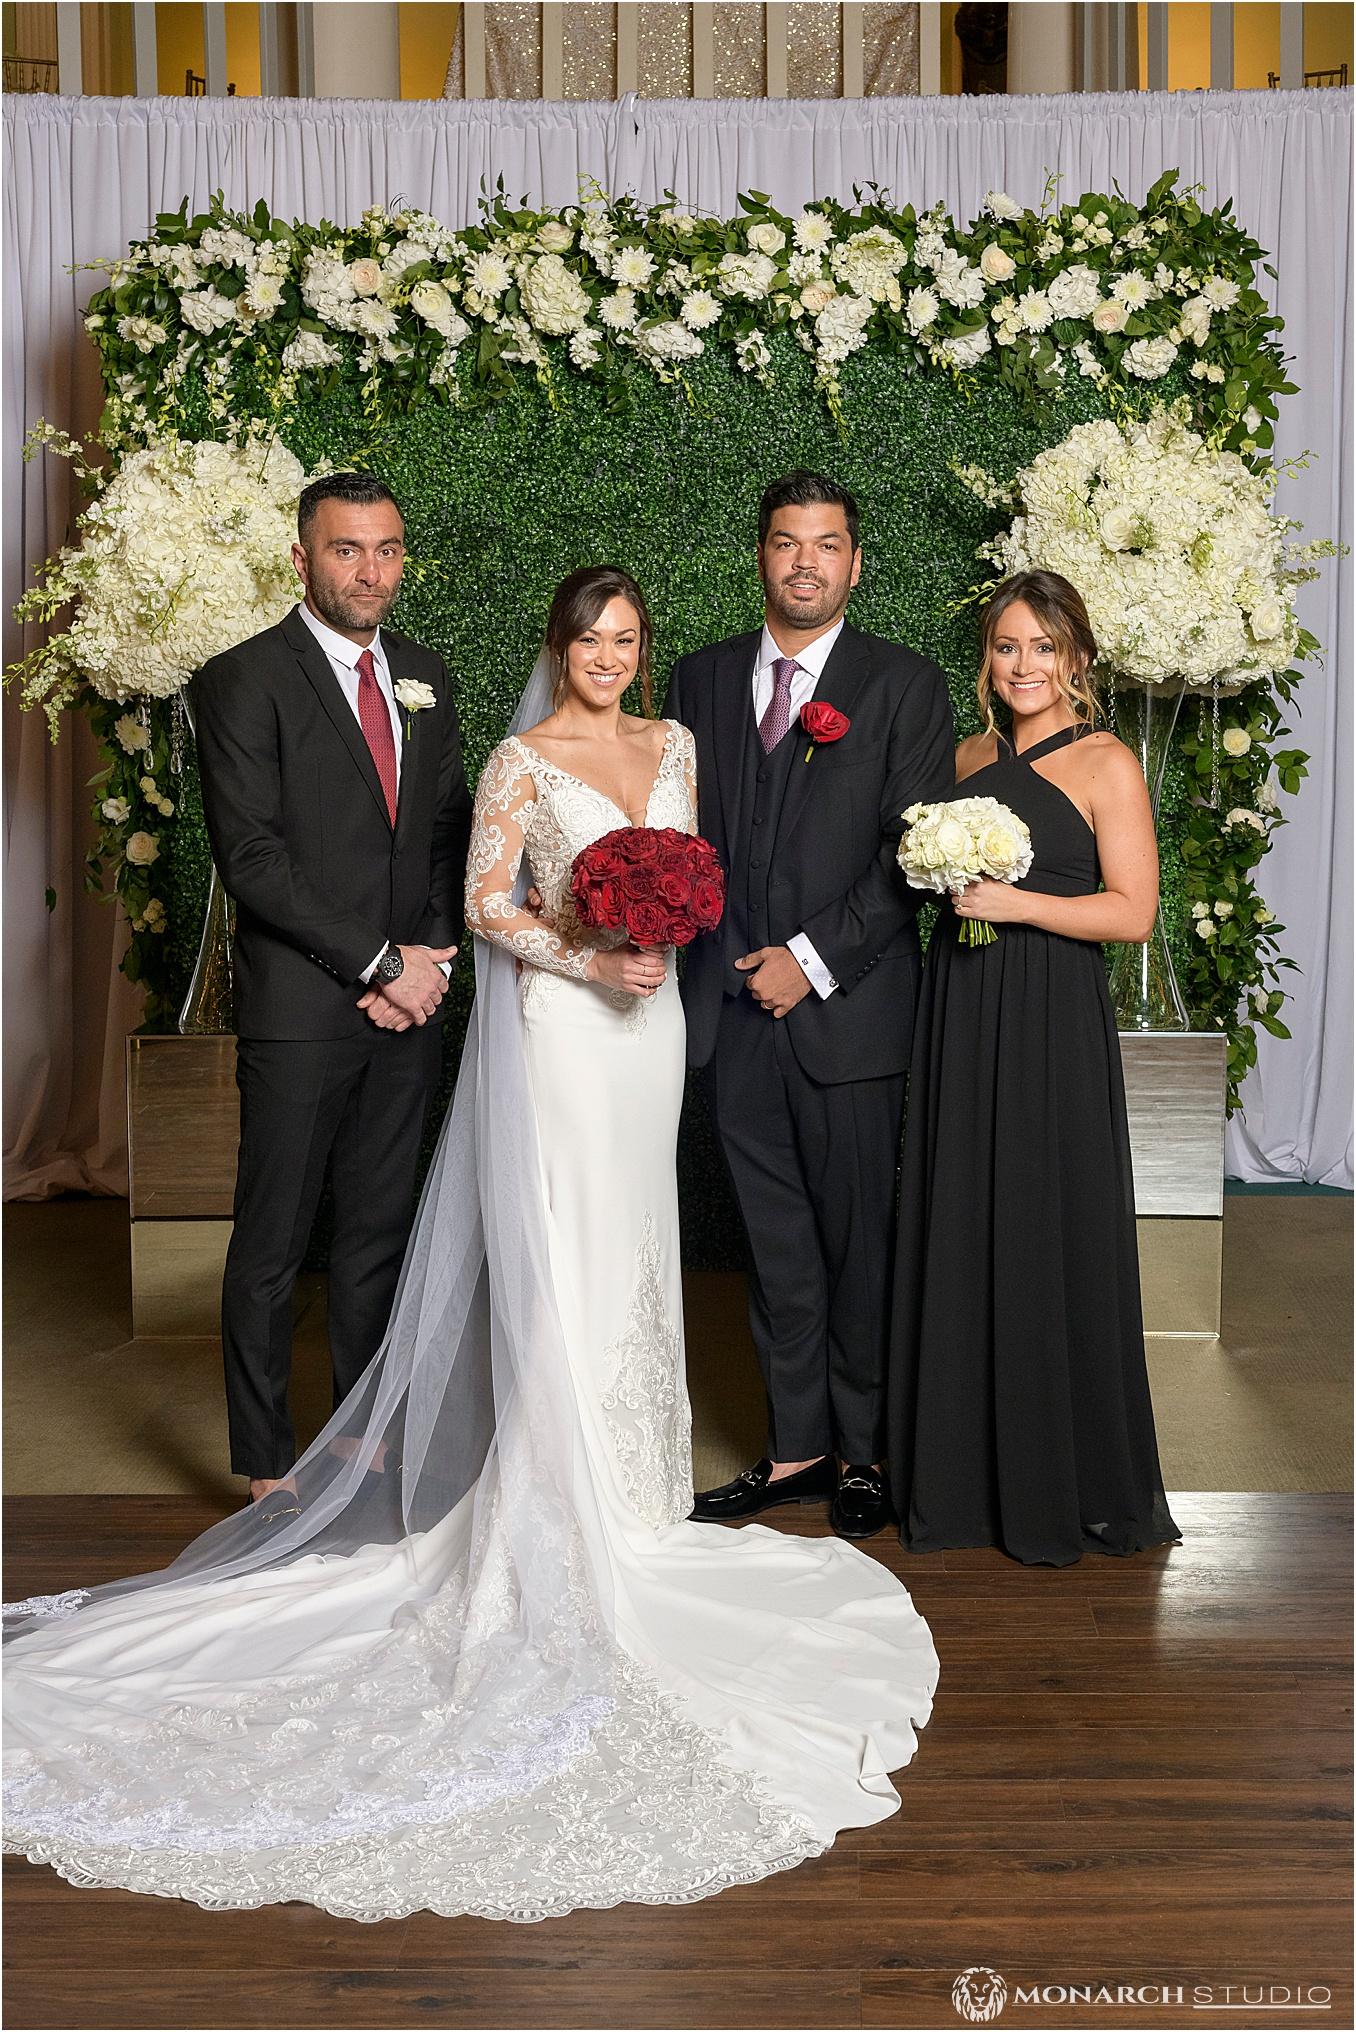 st-augustine-high-end-wedding-photographers-078.jpg